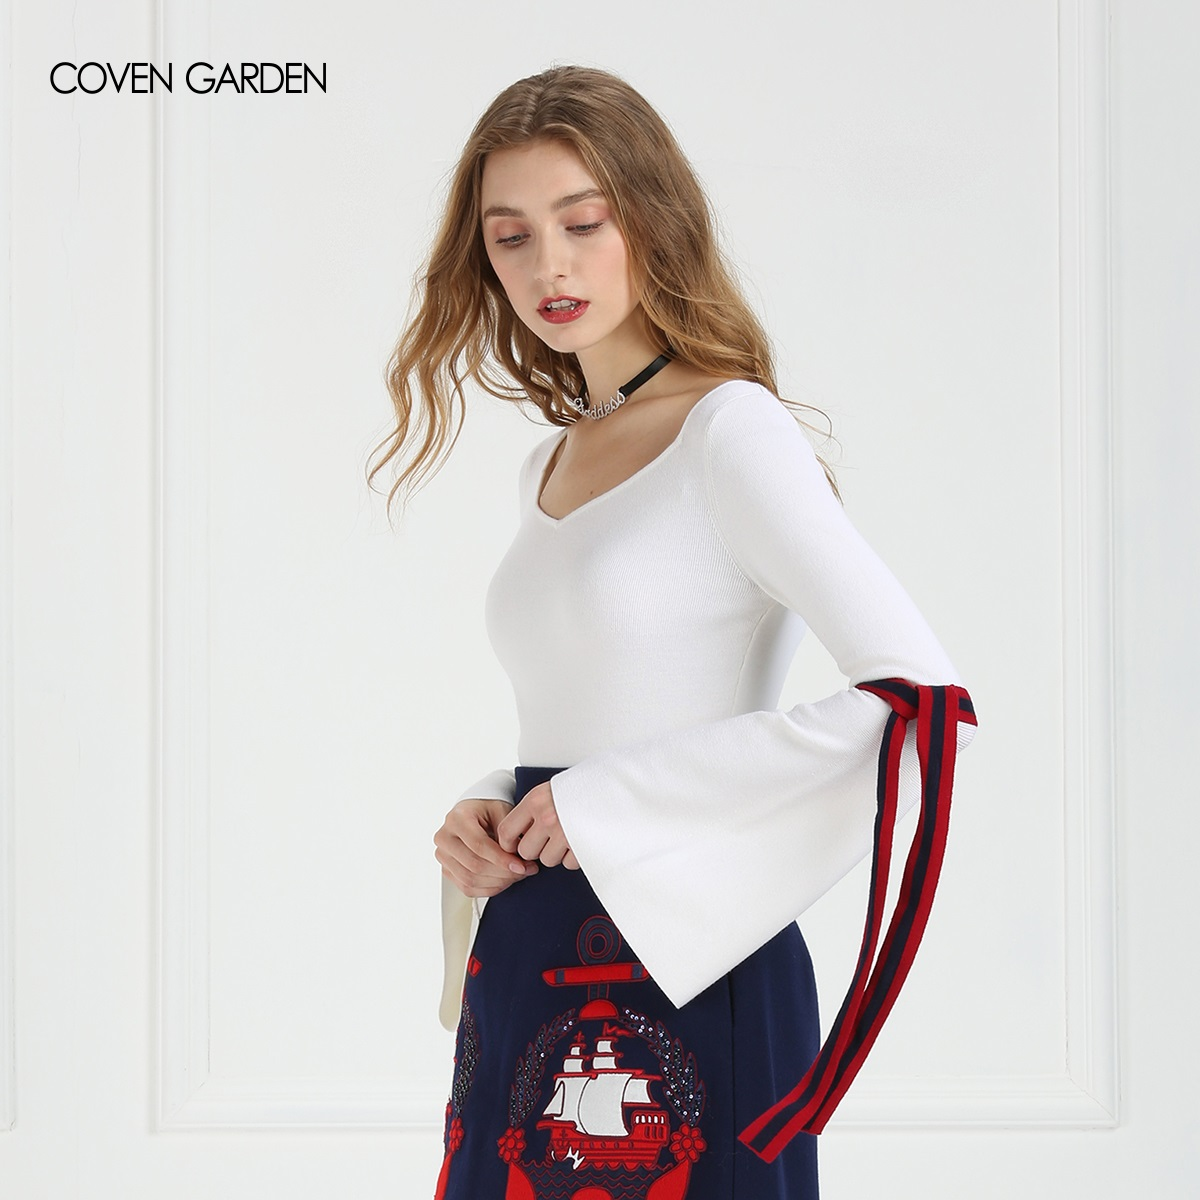 COVEN GARDEN/哥文花园春装纯色圆领羊毛喇叭袖针织衫上衣毛衣女